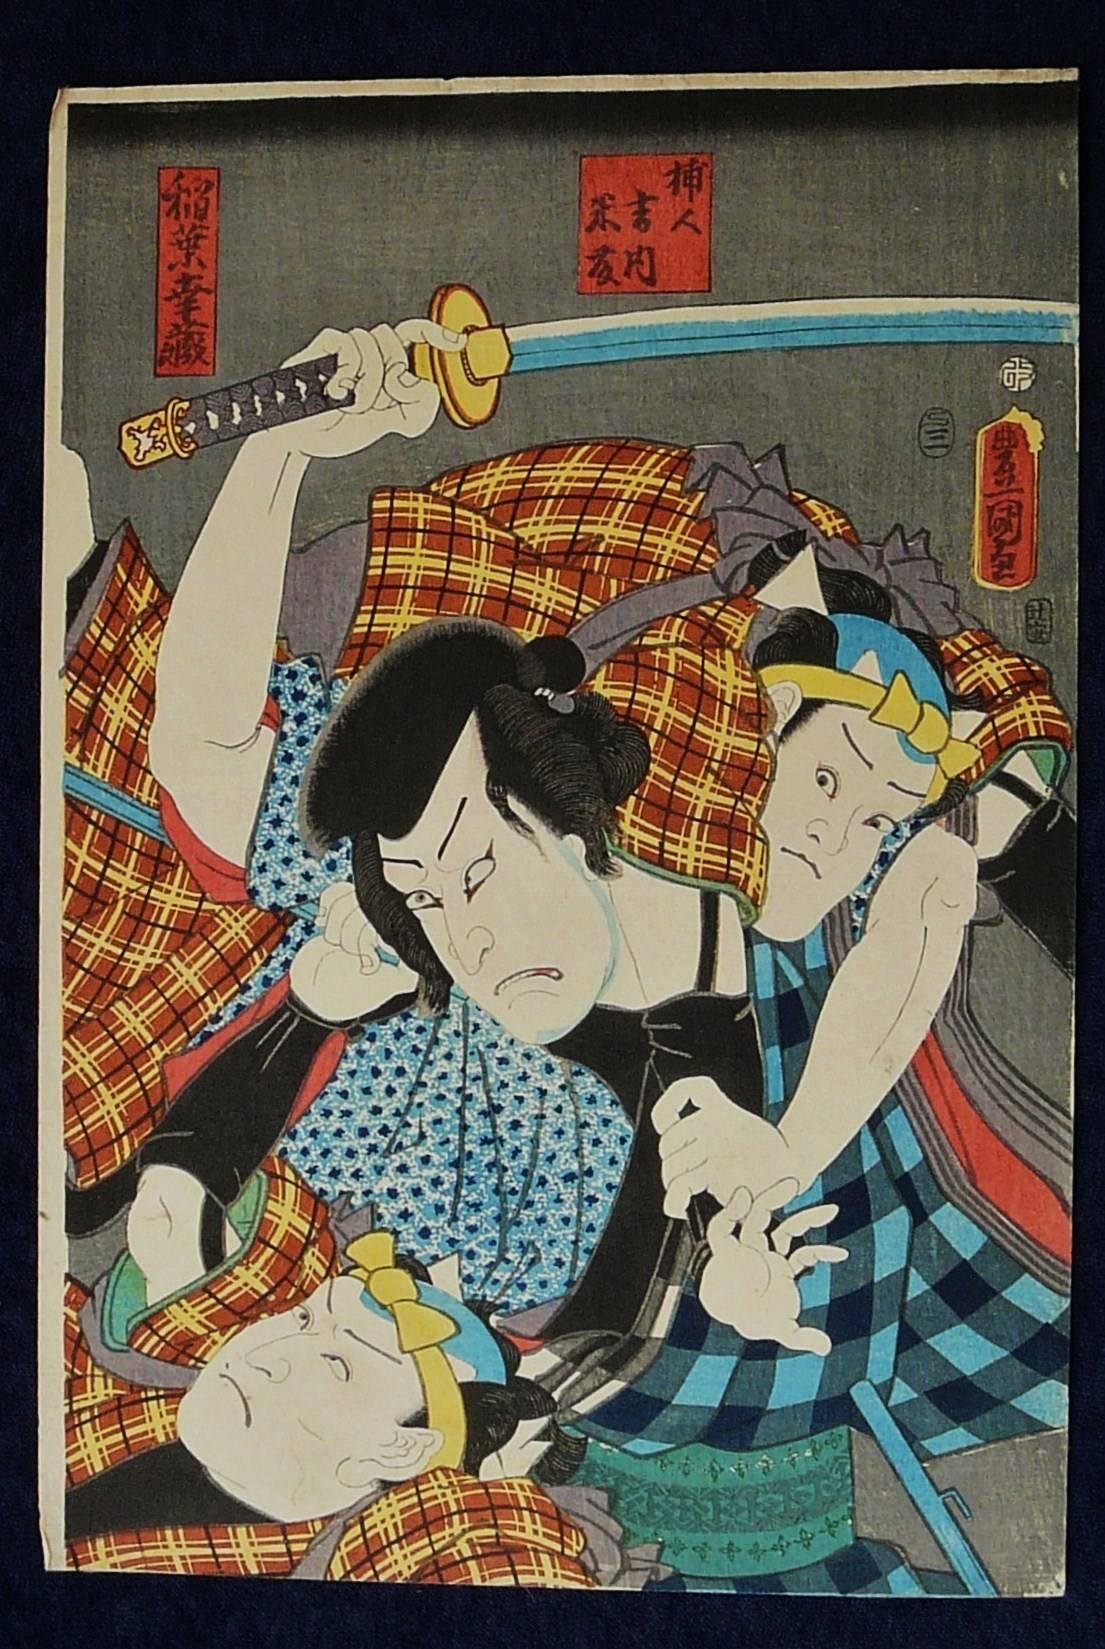 UTAGAWA KUNISADA: #P3659 SAMURAI FIGHTING BANDITS 1853 to 1857